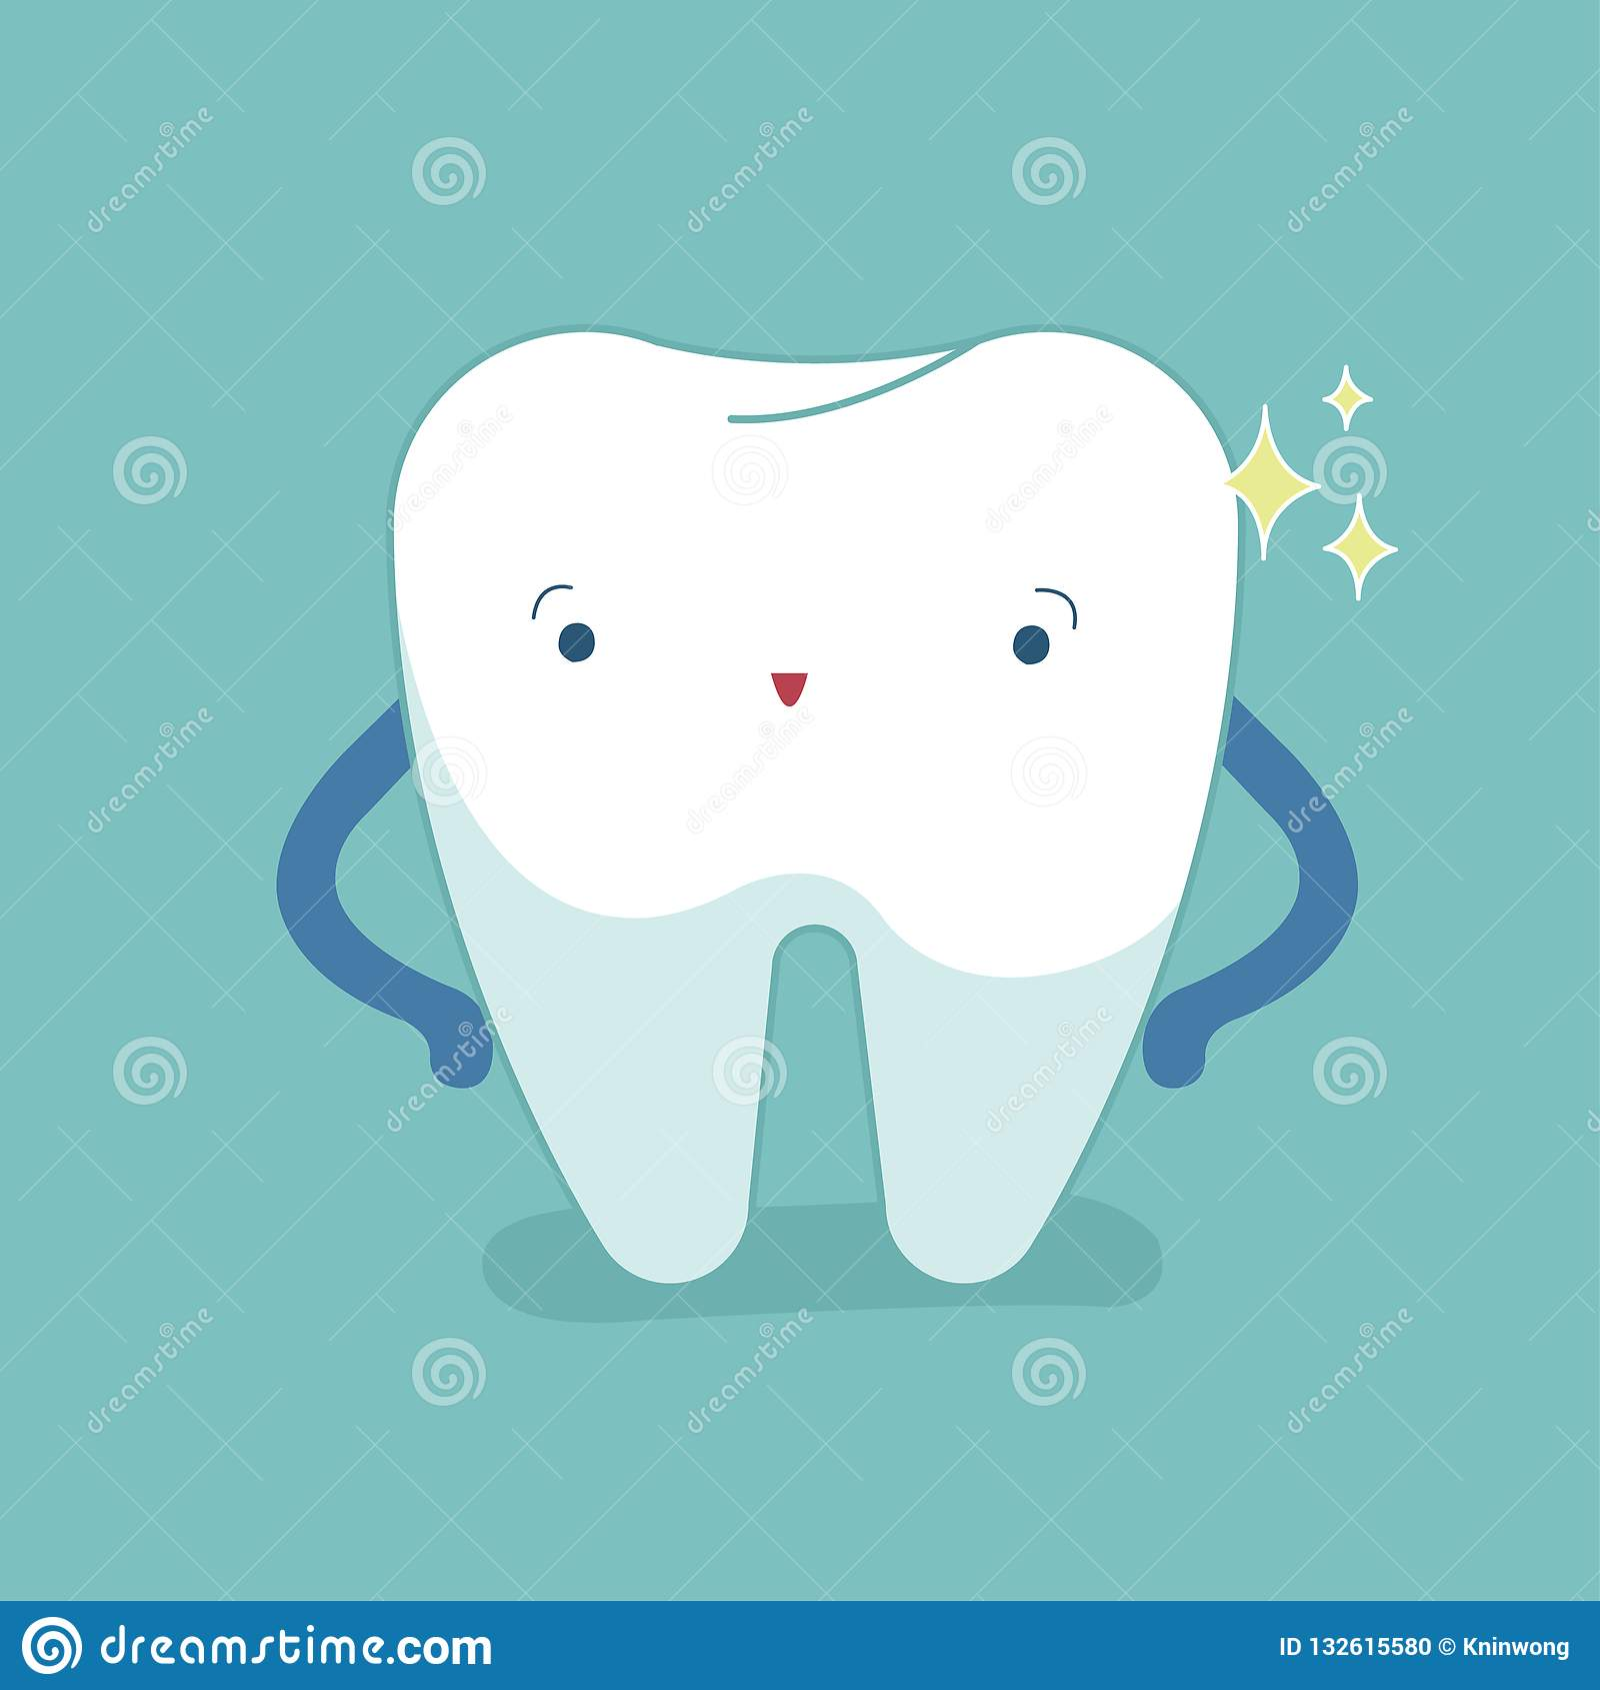 Enkel vit tand, sund tand, muntlig hygien, modern vektor